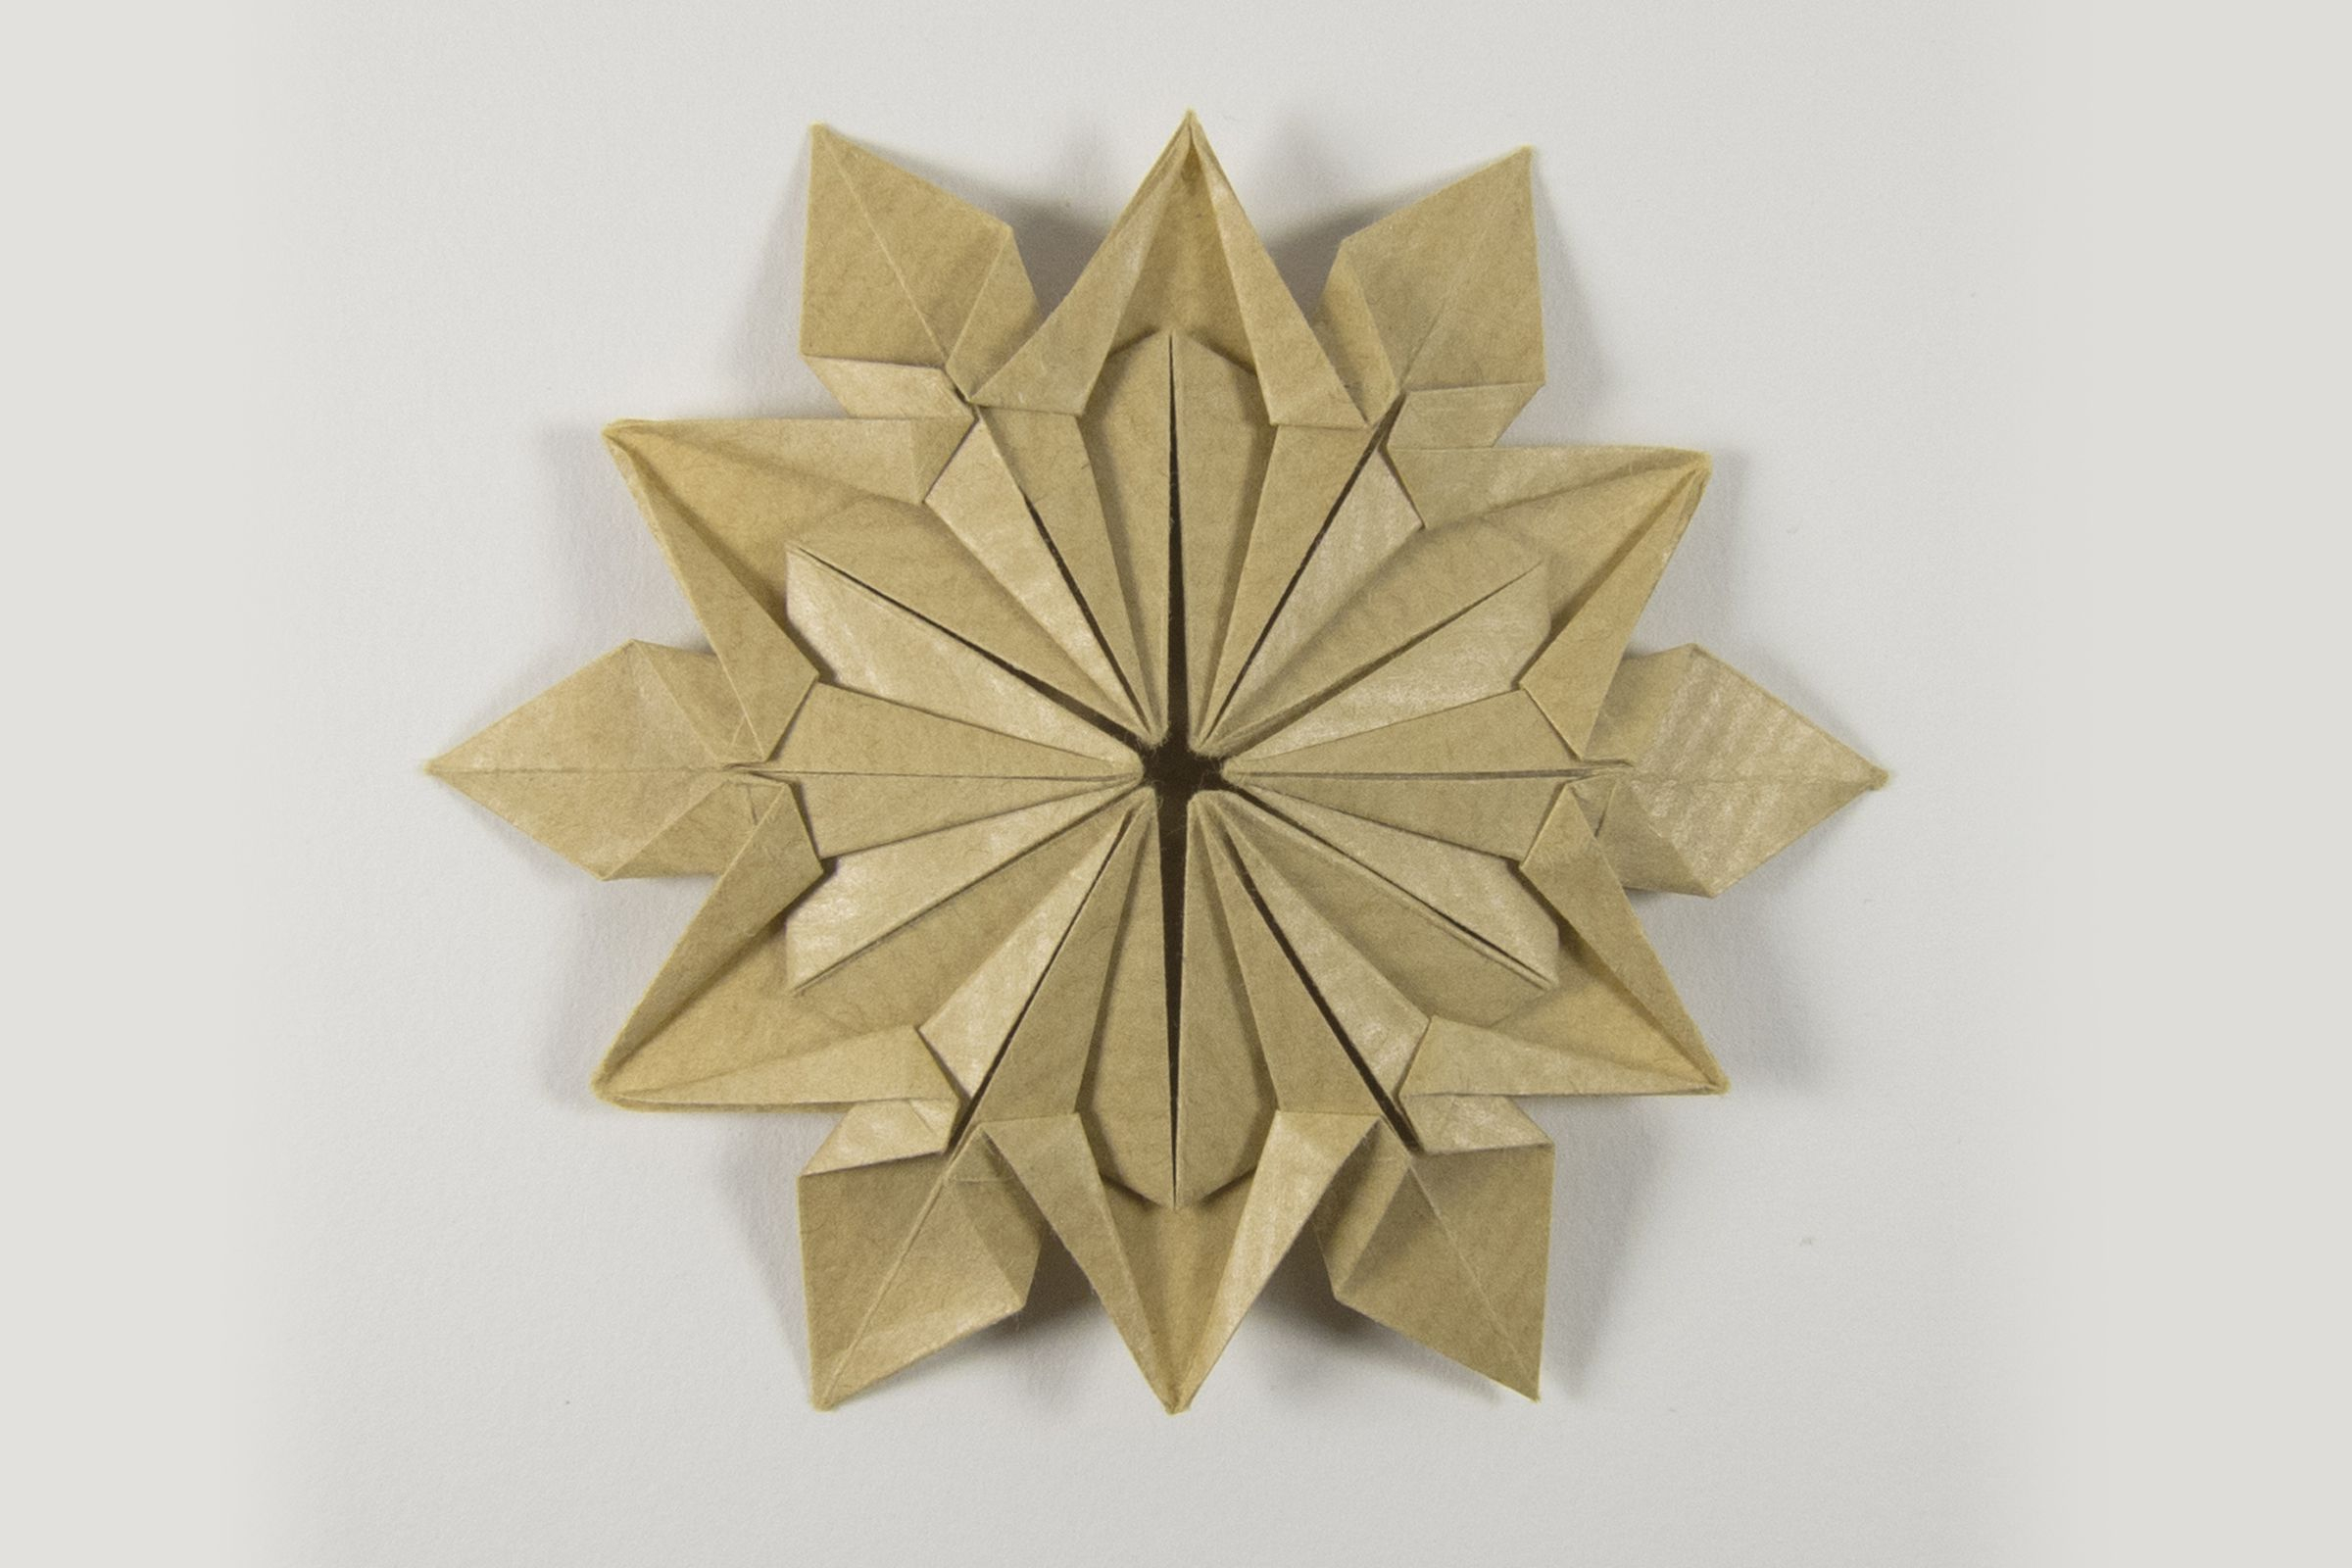 Origami Paper Glossy Slick - 150 mm - 12 sh - Bulk | 1600x2400